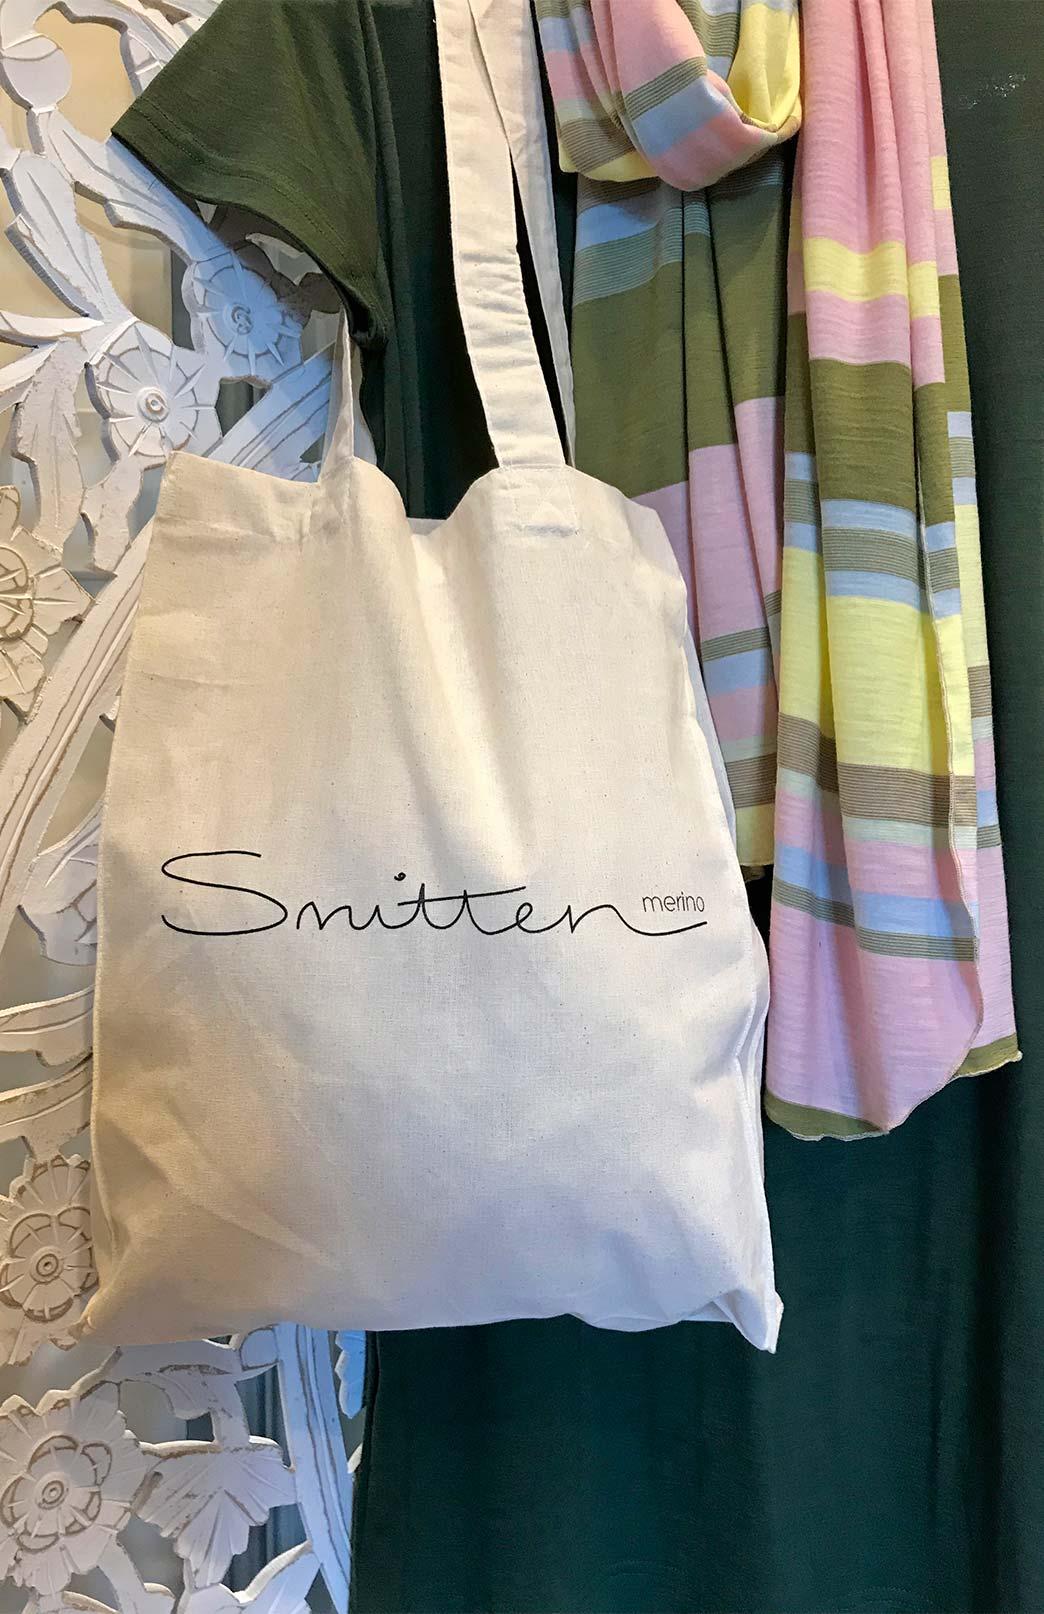 Smitten Reusable Tote Bag - Eco Friendly Reusable Calico Tote Bag with Handles - Smitten Merino Tasmania Australia